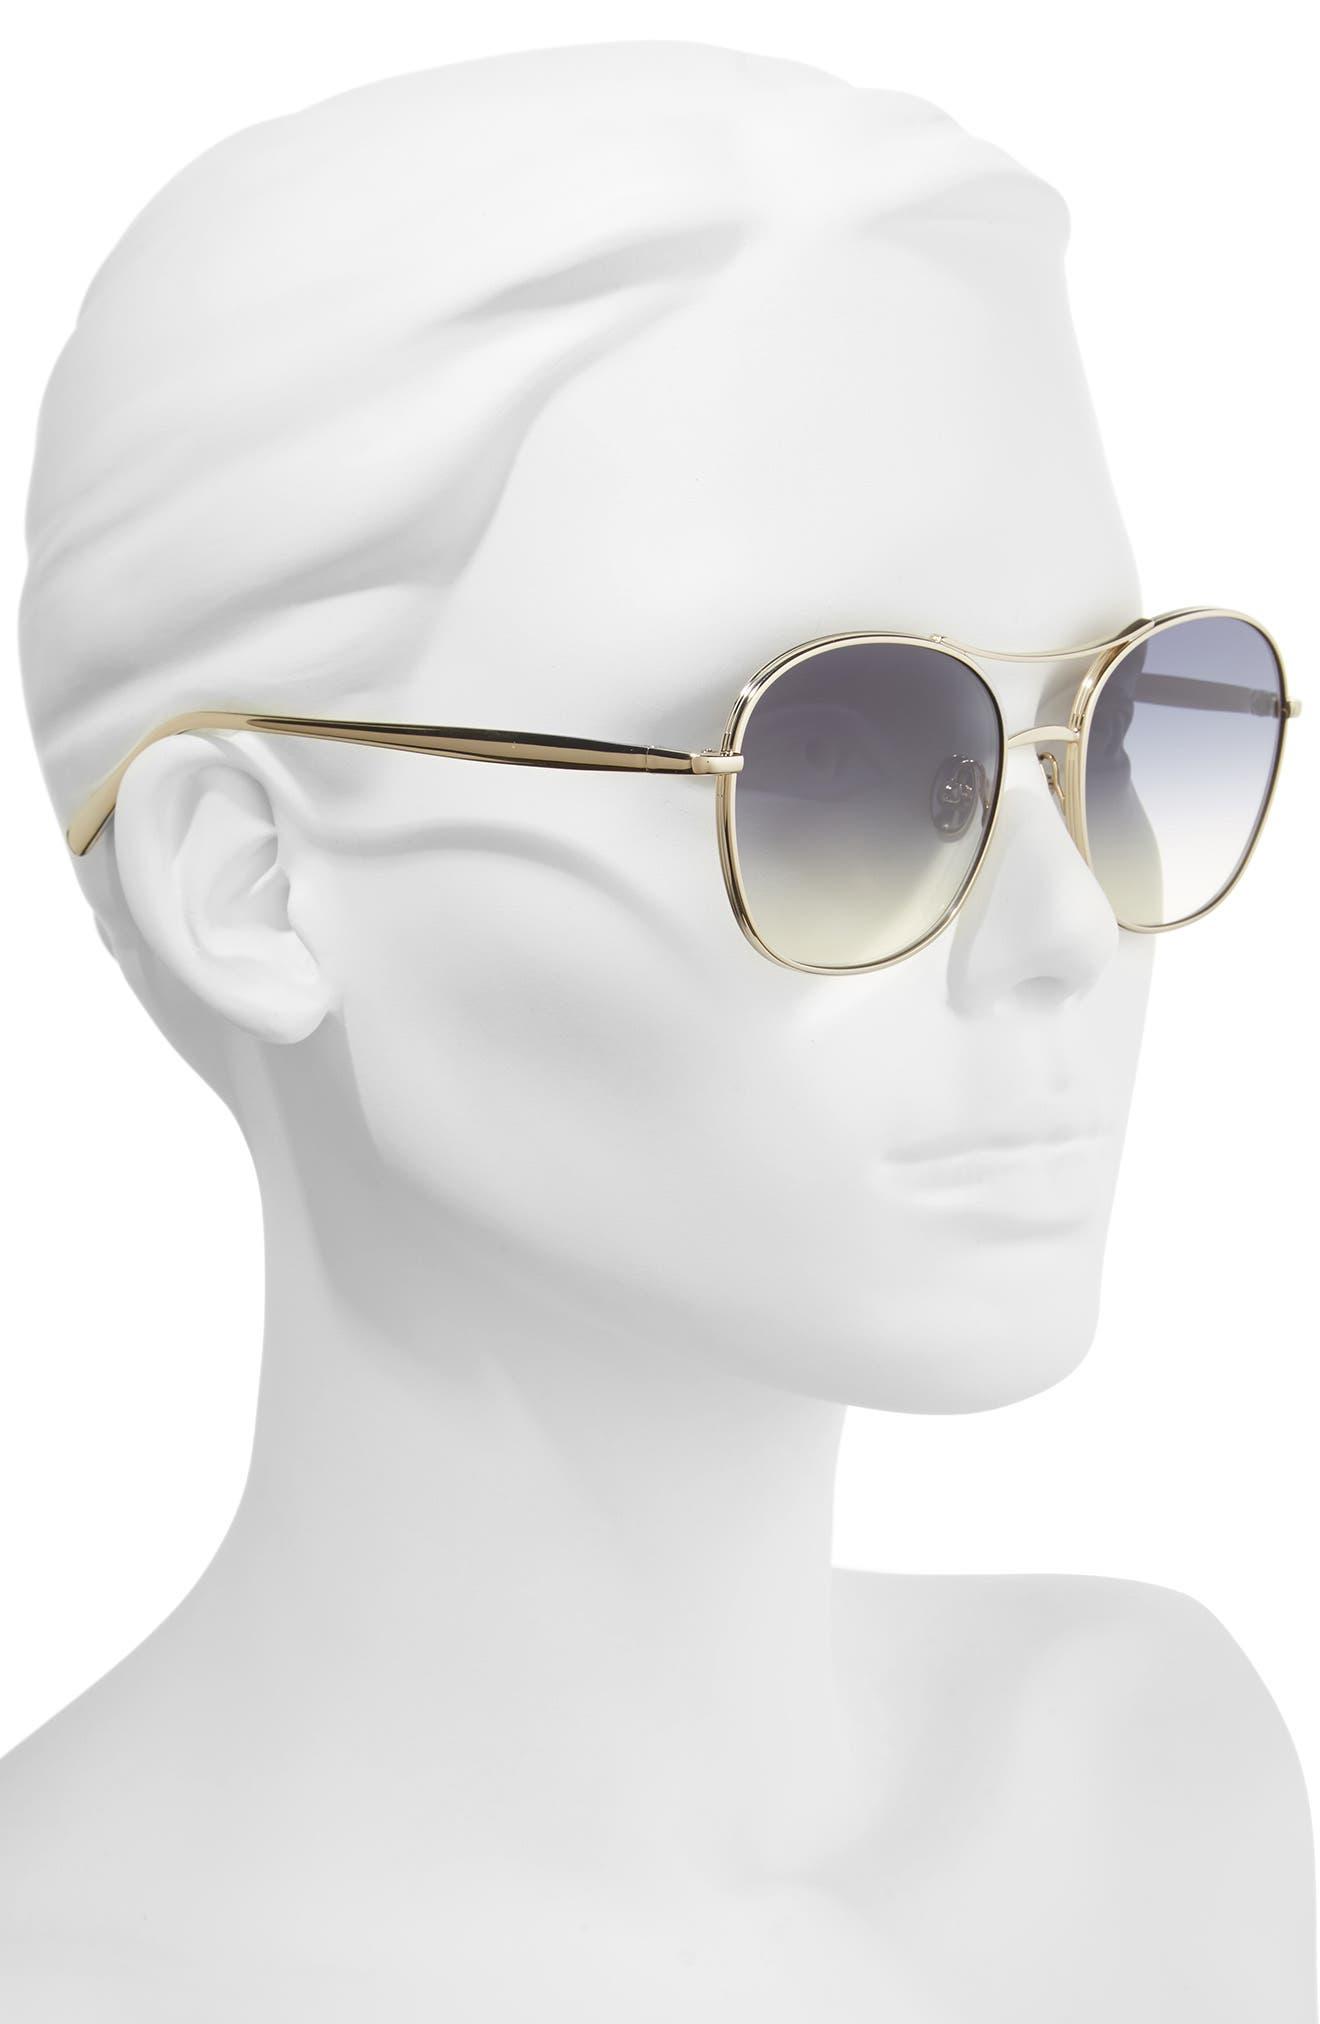 54mm Aviator Sunglasses,                             Alternate thumbnail 2, color,                             710